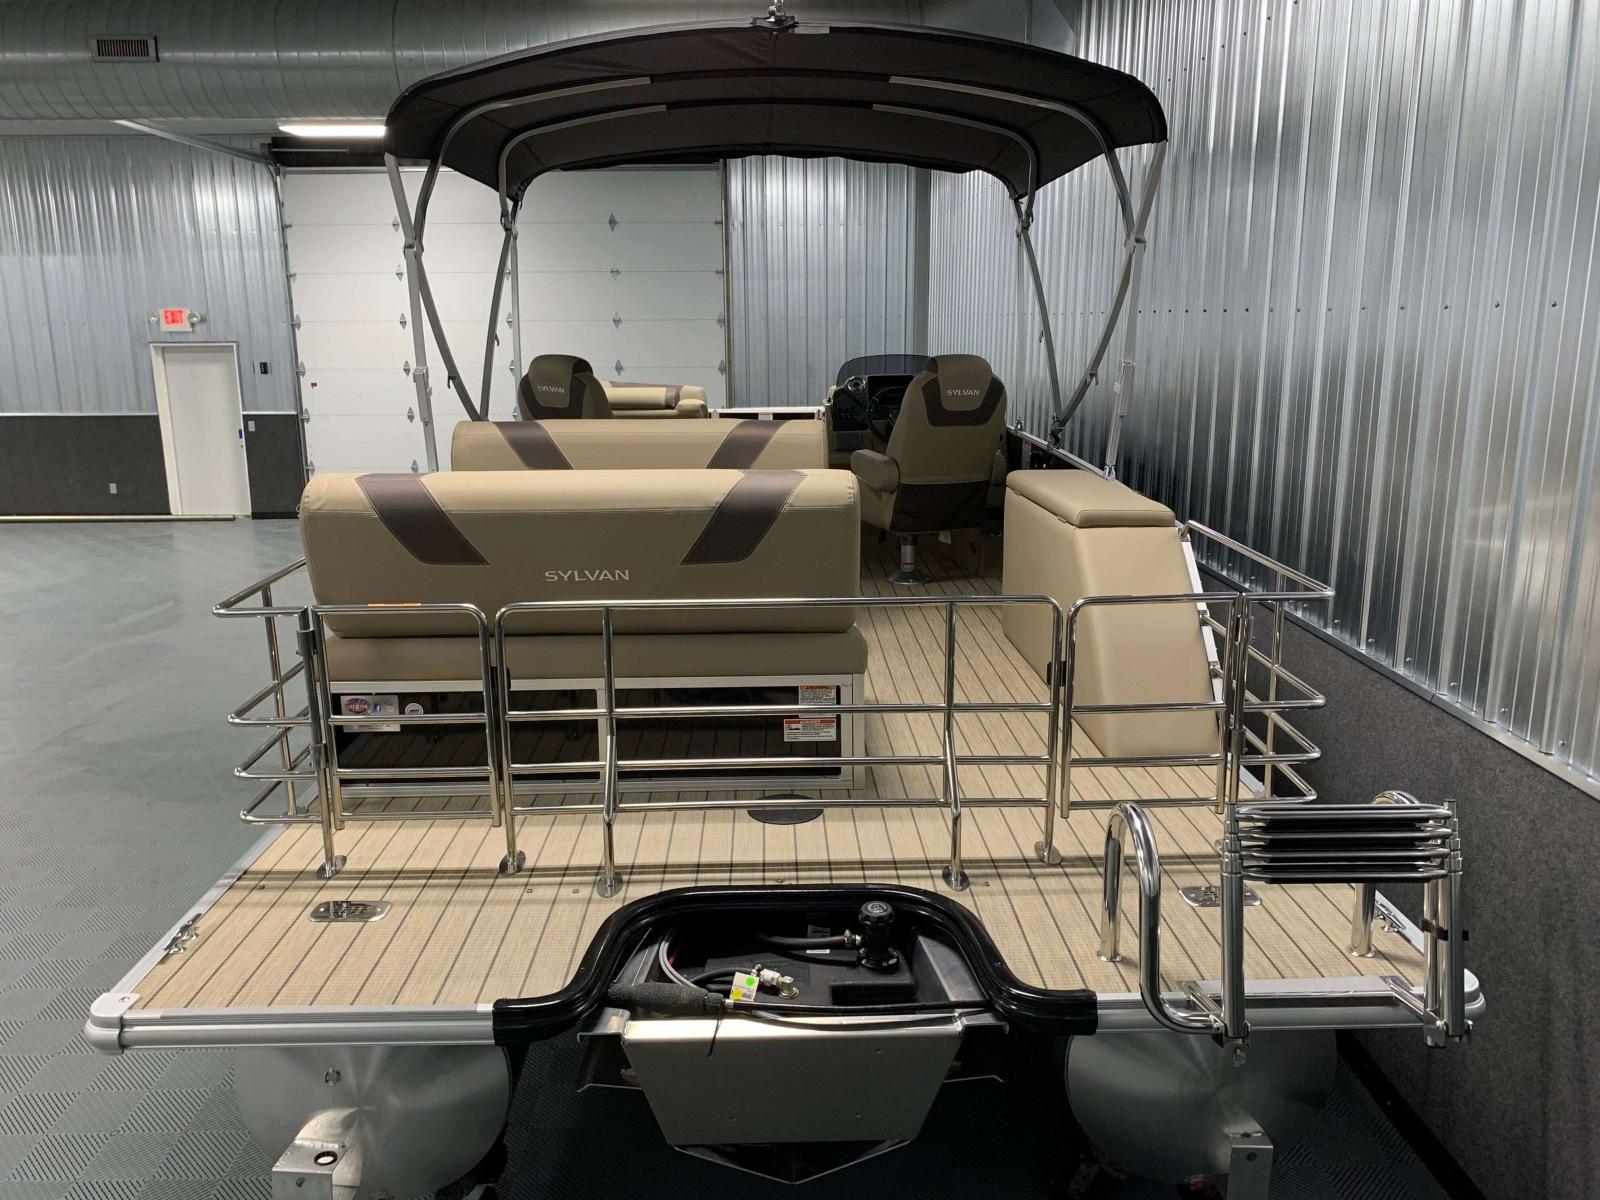 Extended Rear Swim Deck of the 2021 Sylvan L3 DLZ Pontoon Boat